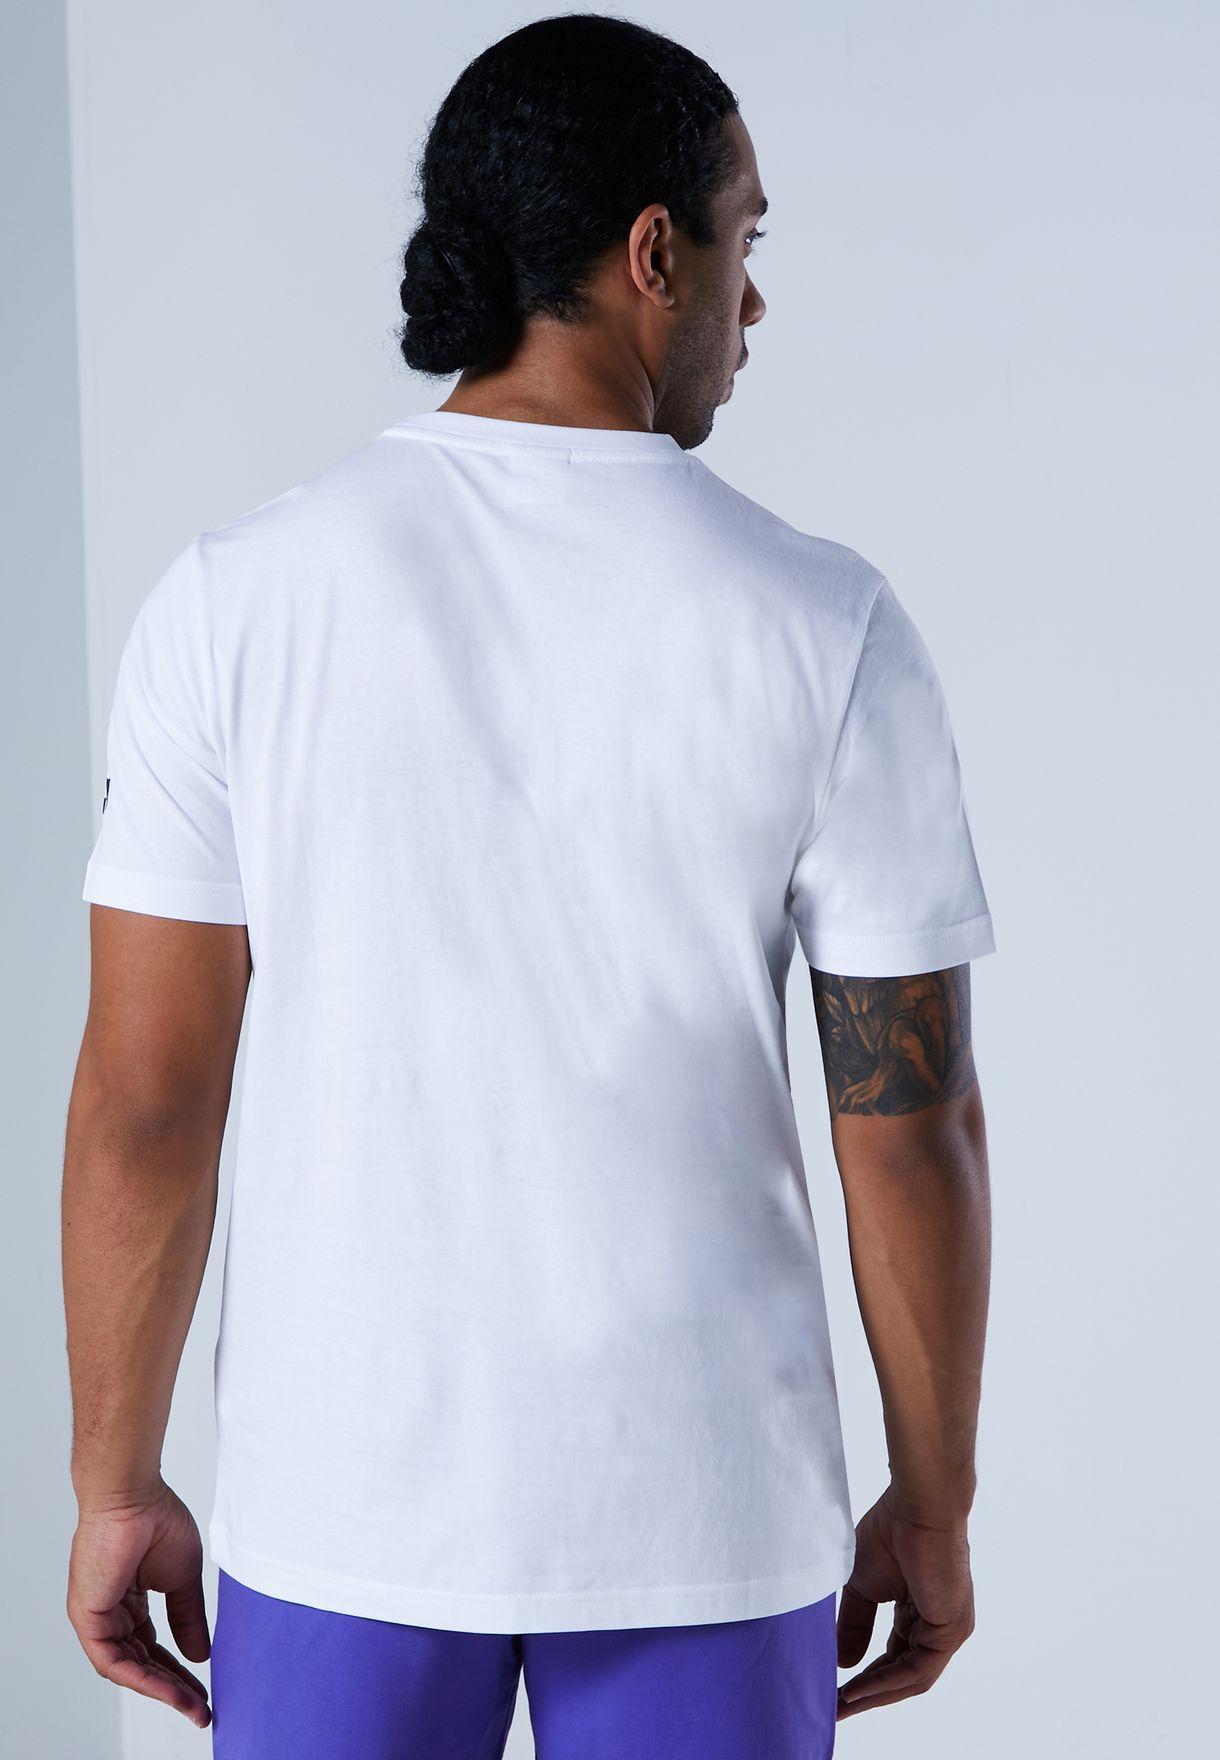 TFS Graphic T-Shirt